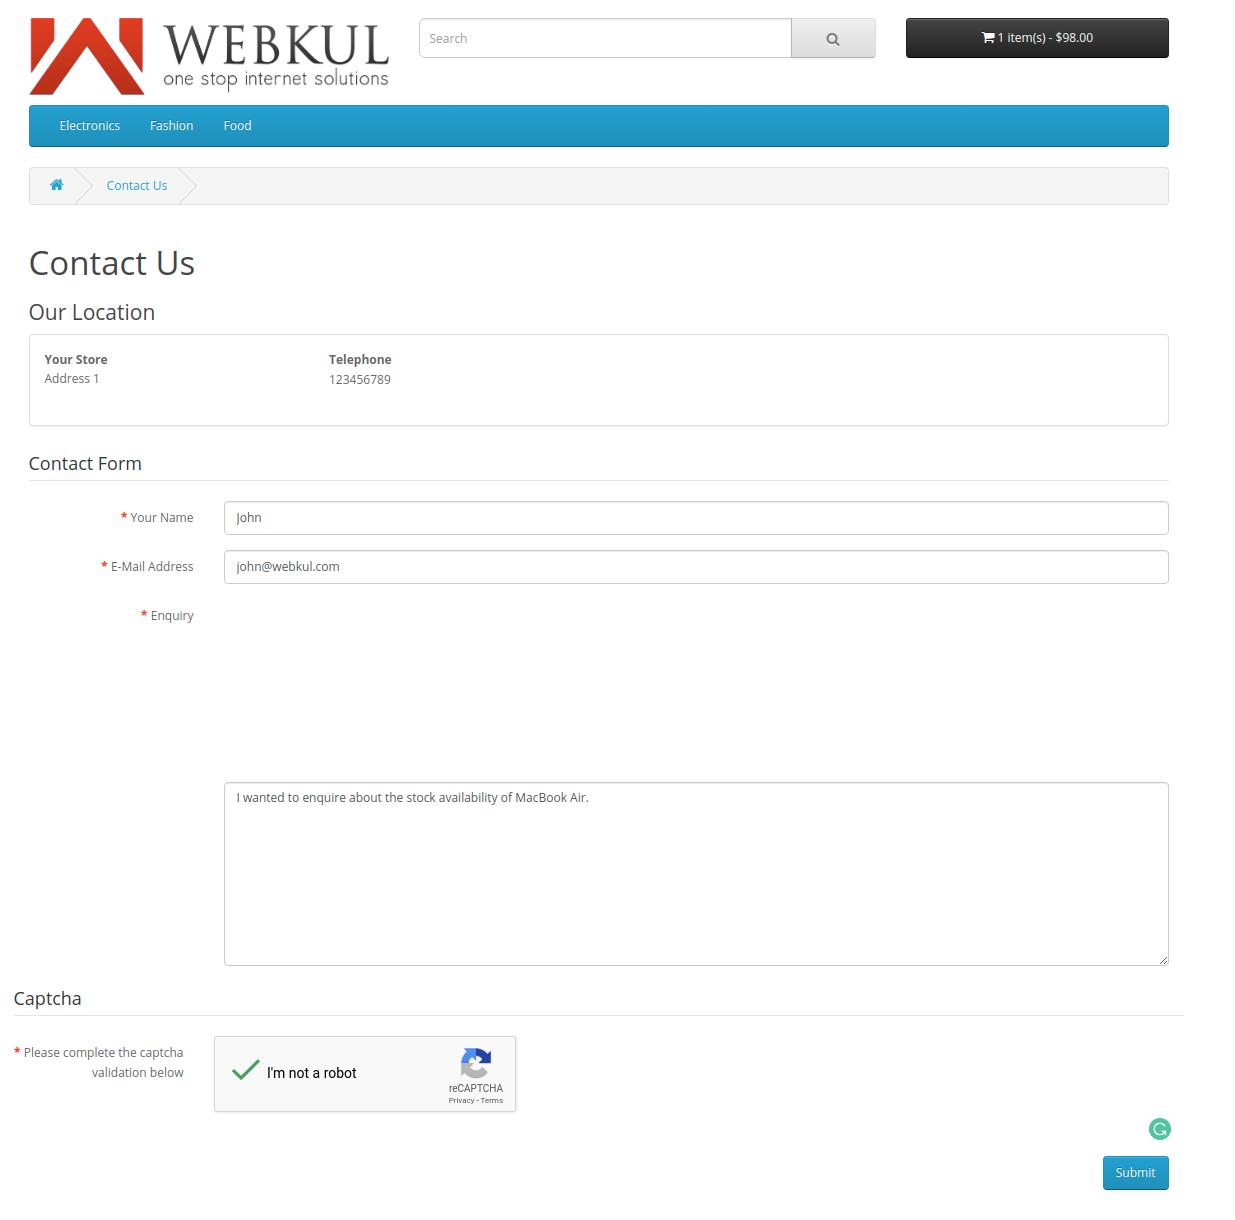 webkul-opencart-web-application-firewall-security-recaptcha-at-contact-us-form